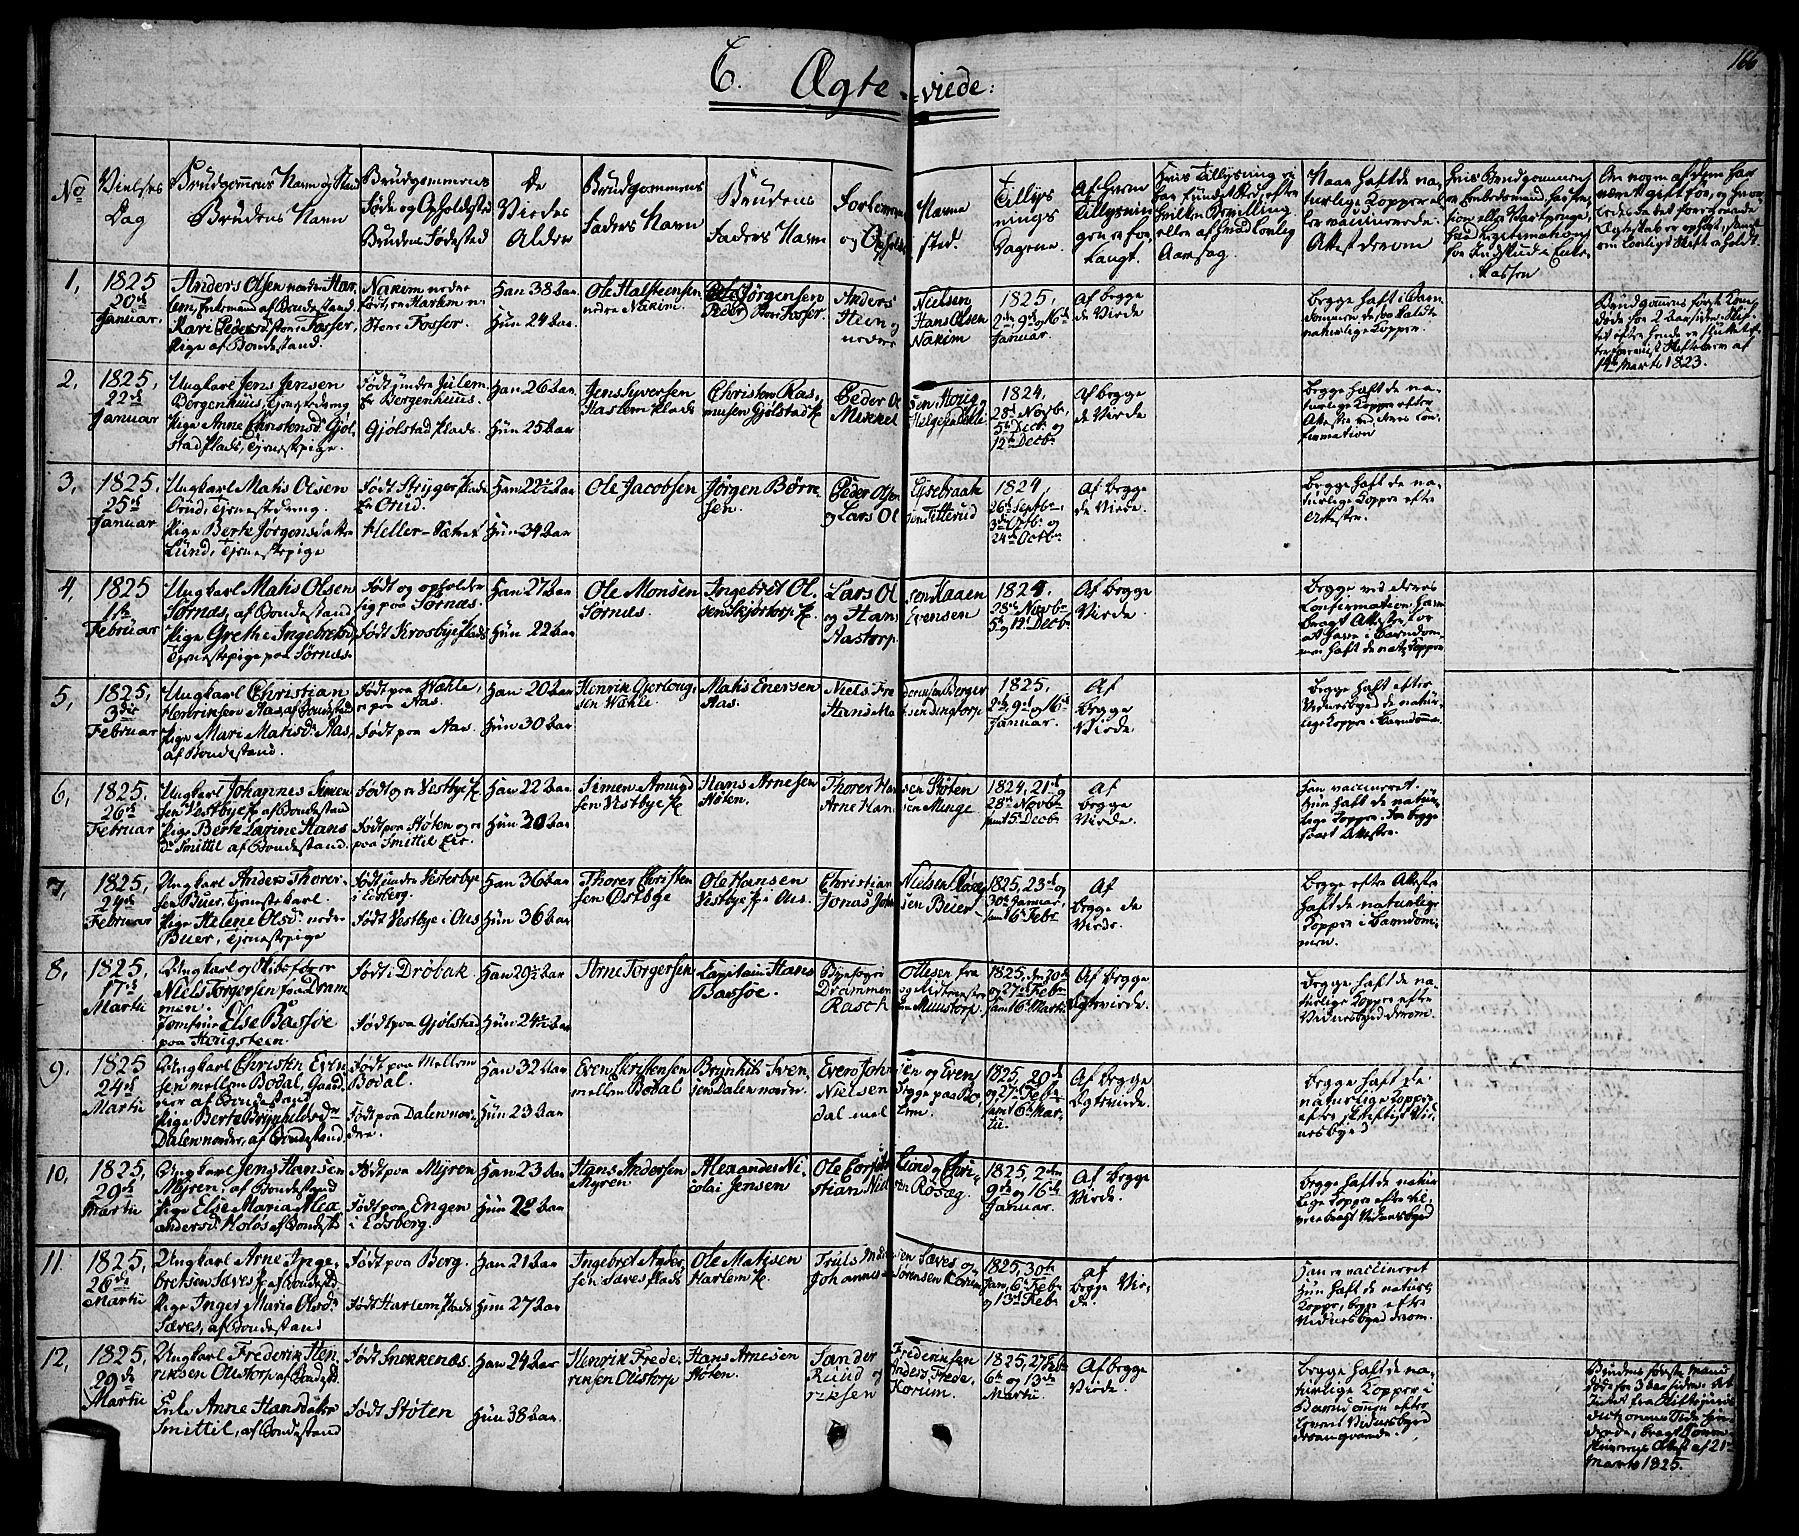 SAO, Rakkestad prestekontor Kirkebøker, F/Fa/L0007: Ministerialbok nr. I 7, 1825-1841, s. 166